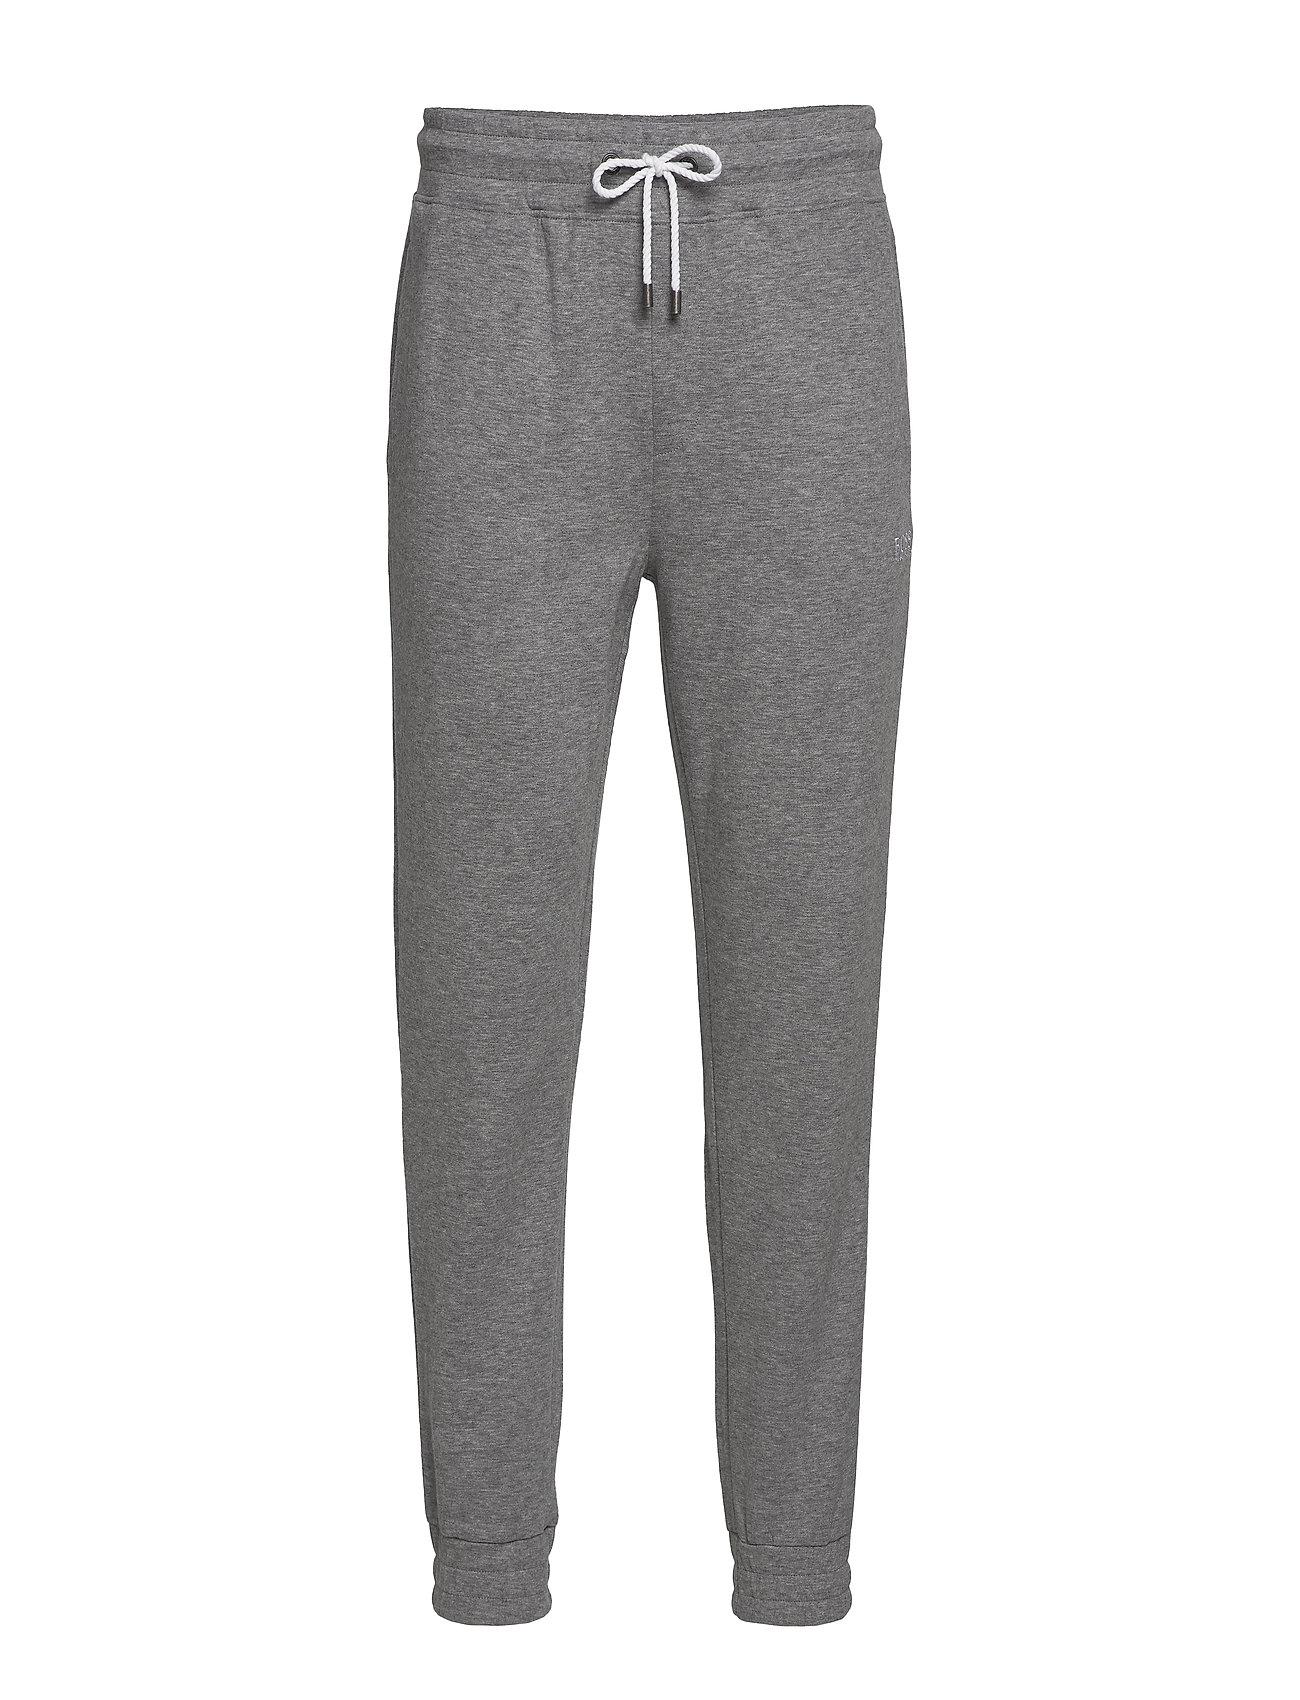 BOSS Business Cashmere Pants - MEDIUM GREY